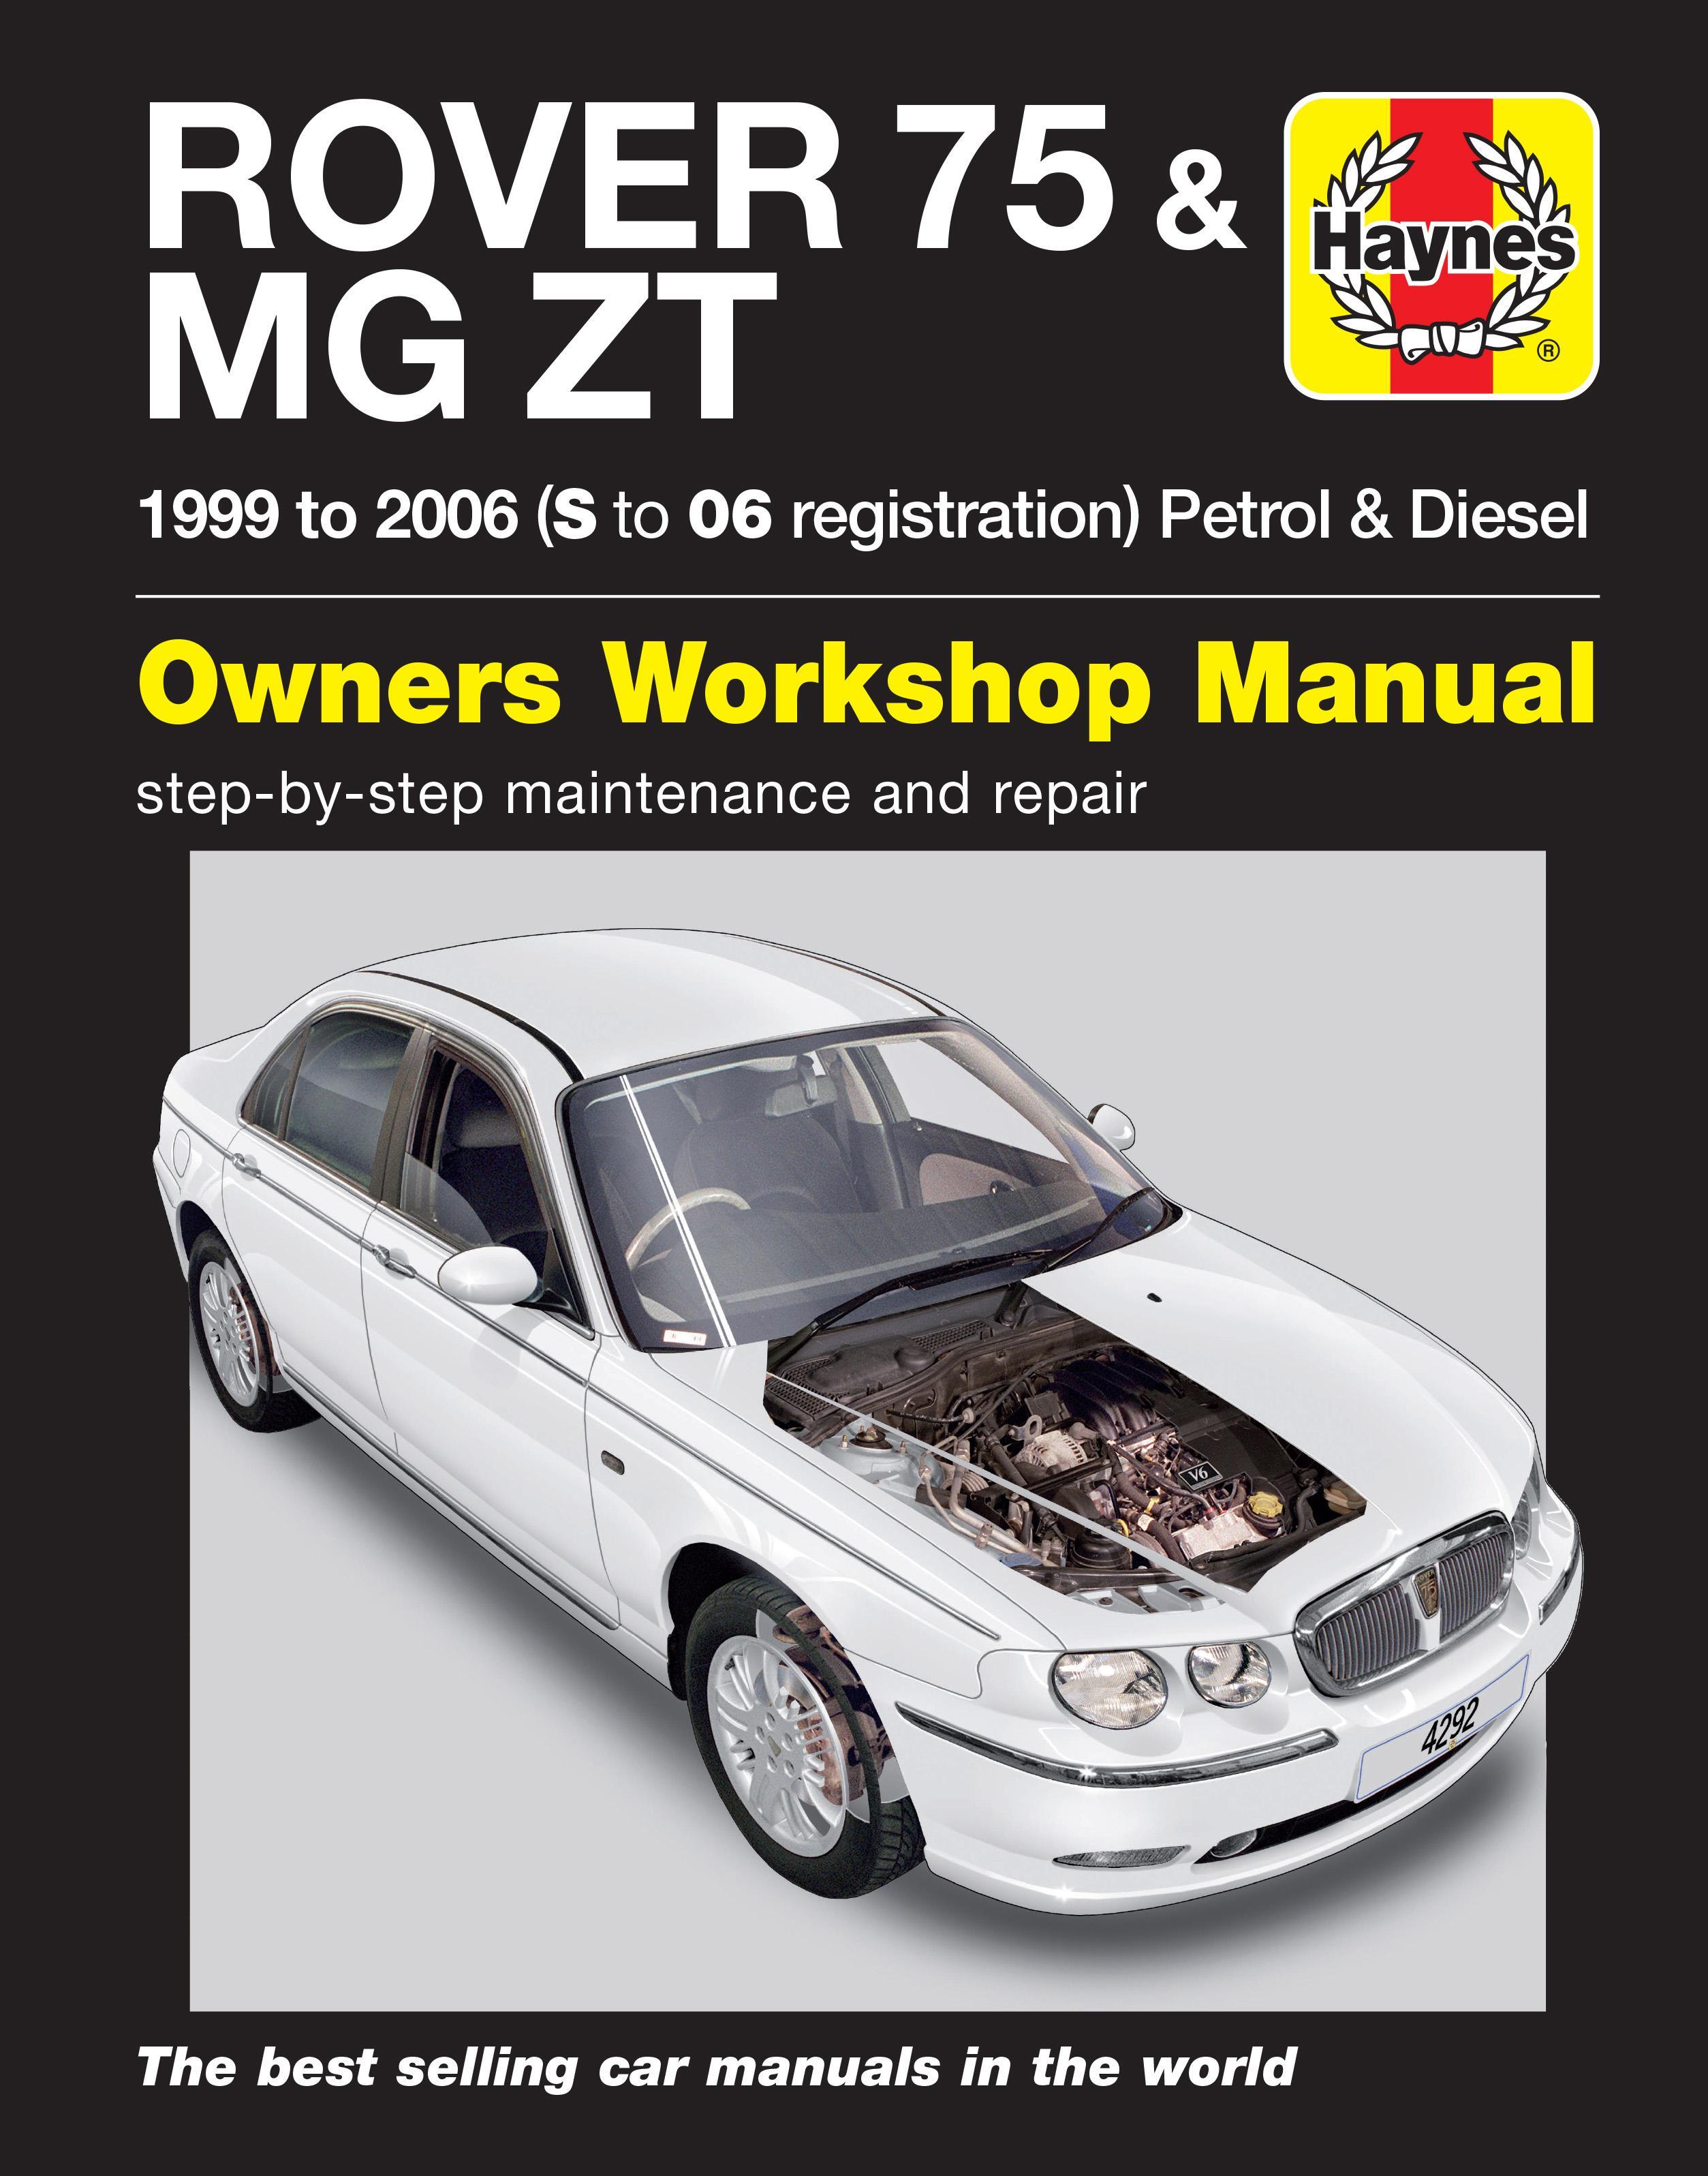 haynes rover 75 mg zt feb 99 06 rh halfords com Mygmlink Owner's Manual Haynes Manual for Quads